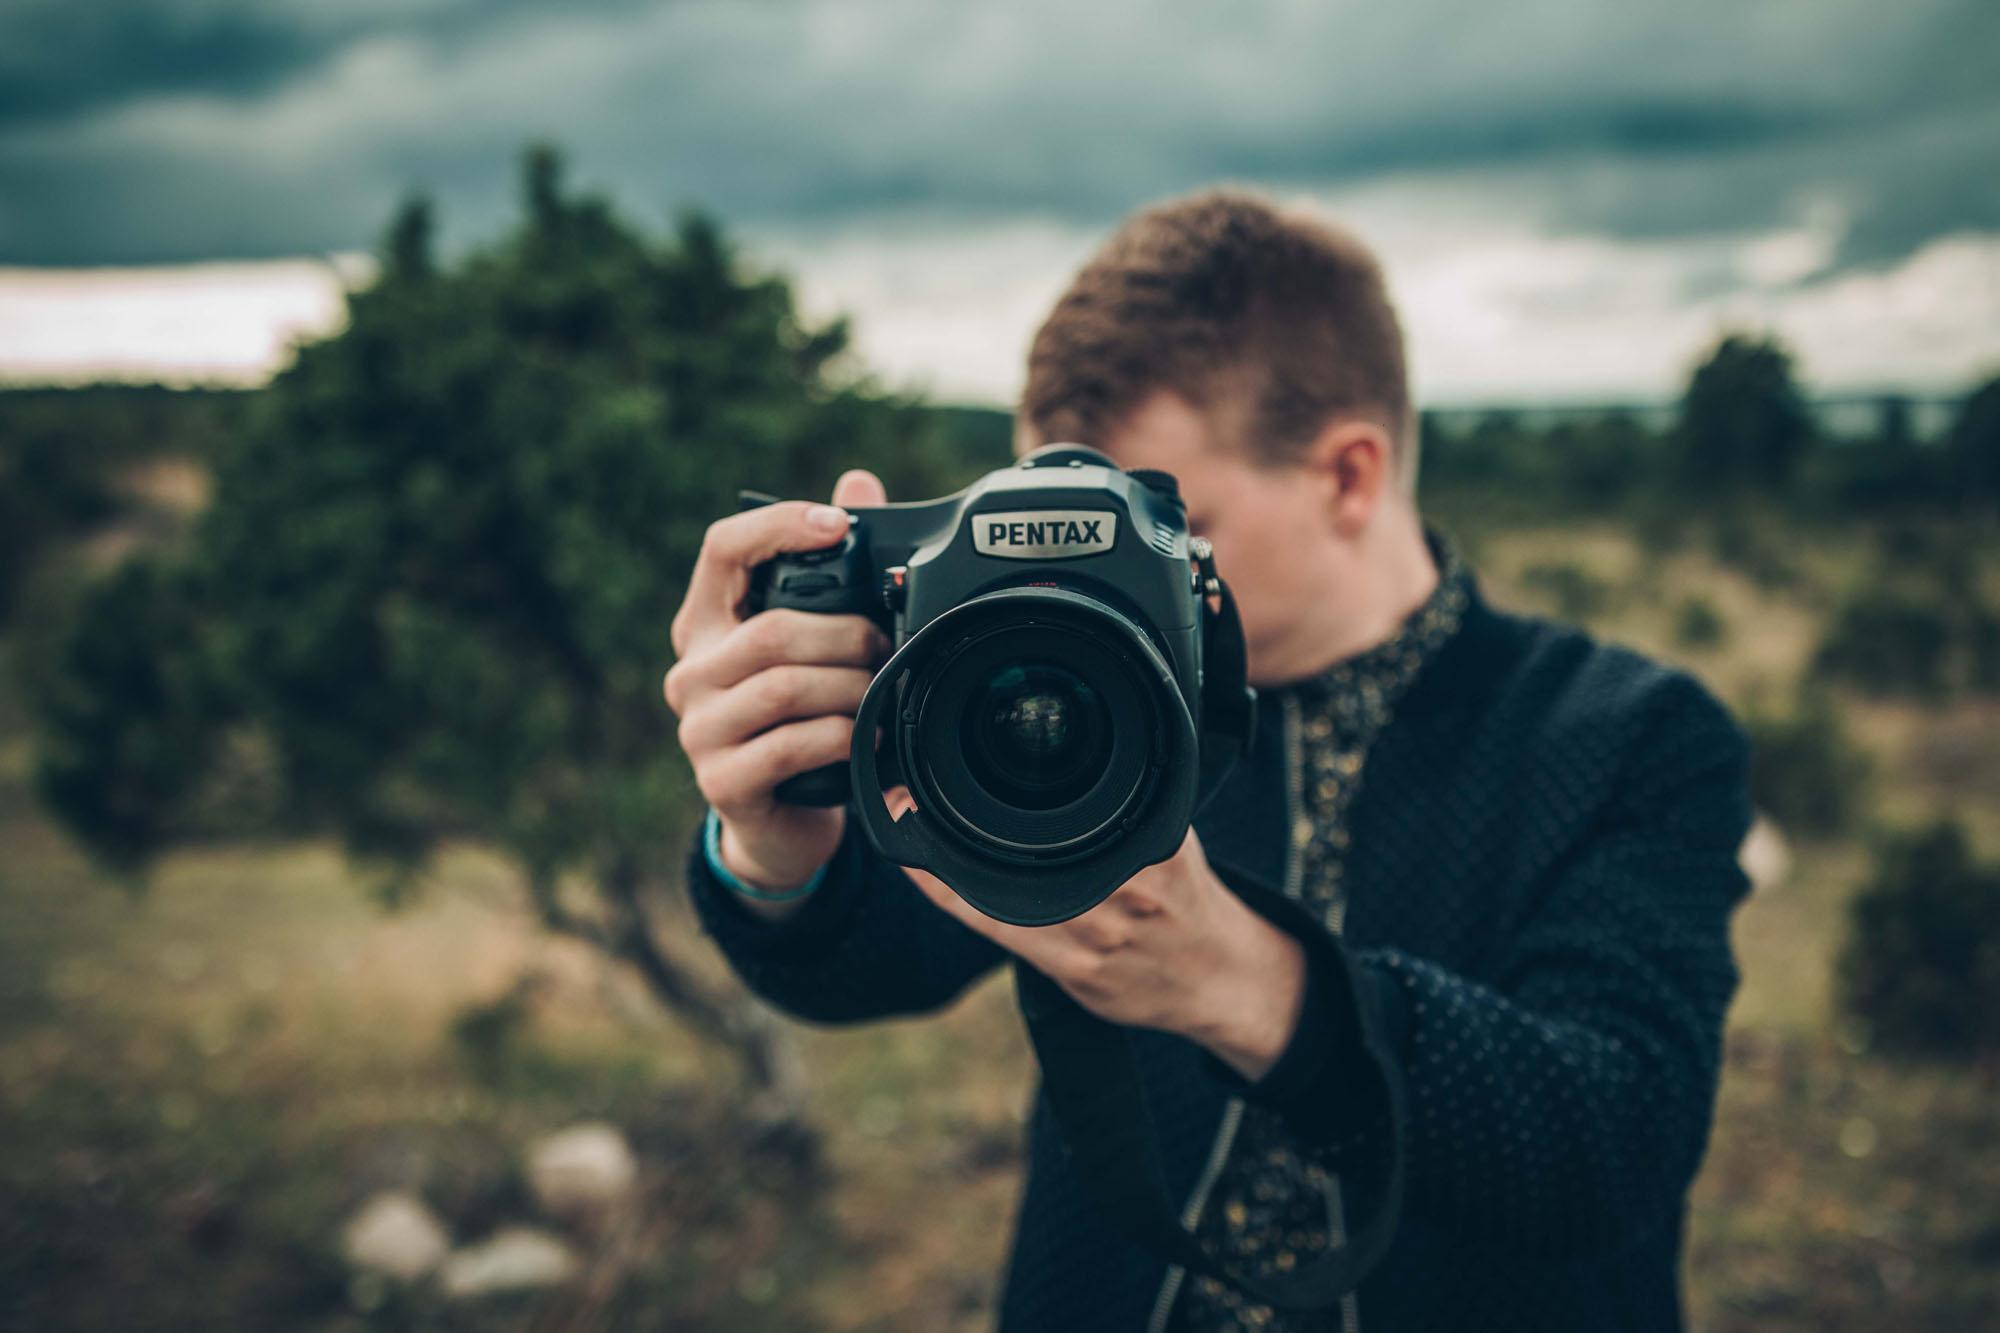 Pea ees tundmatusse koos Pentax 645Z keskformaatkaameraga